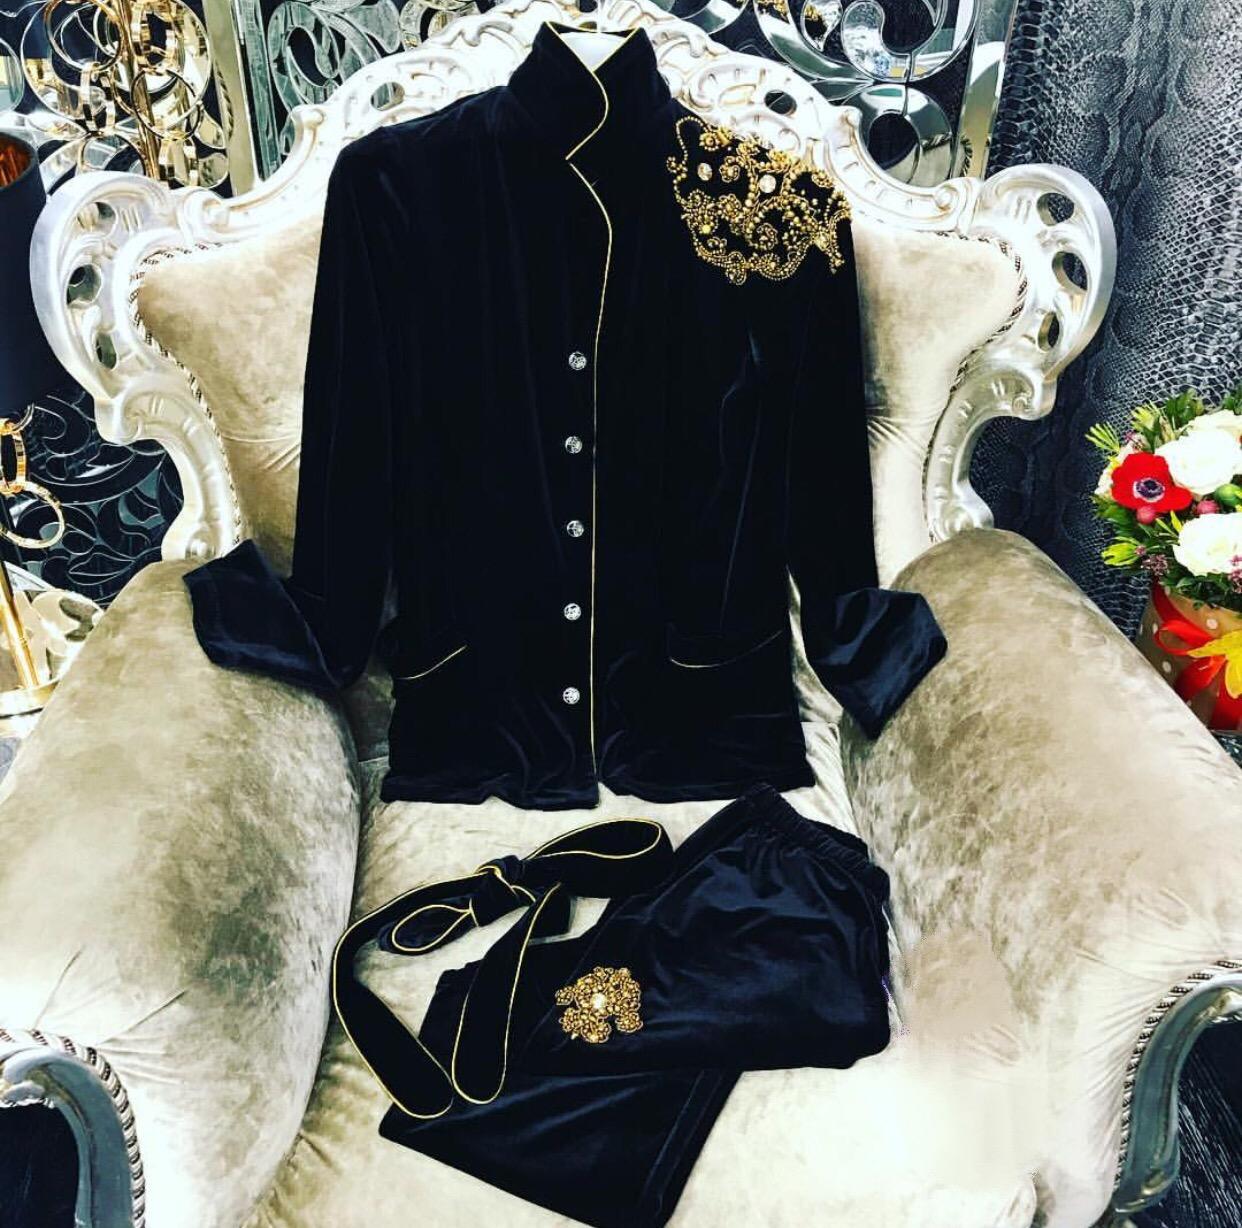 Black and gold luxury coordinates